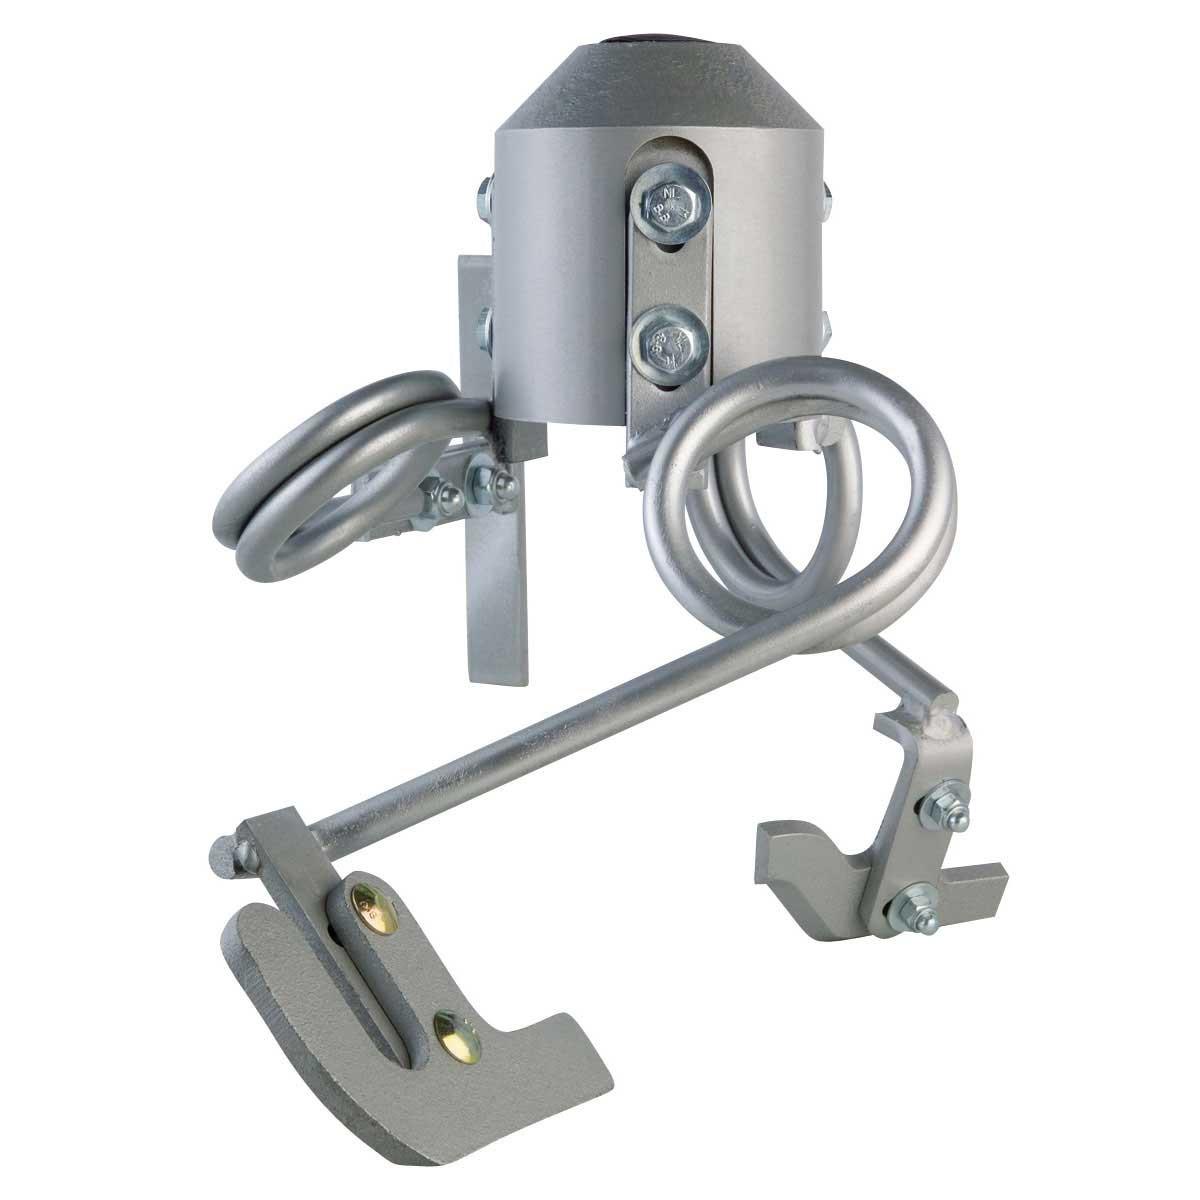 Collomix Mortar Mixer top view